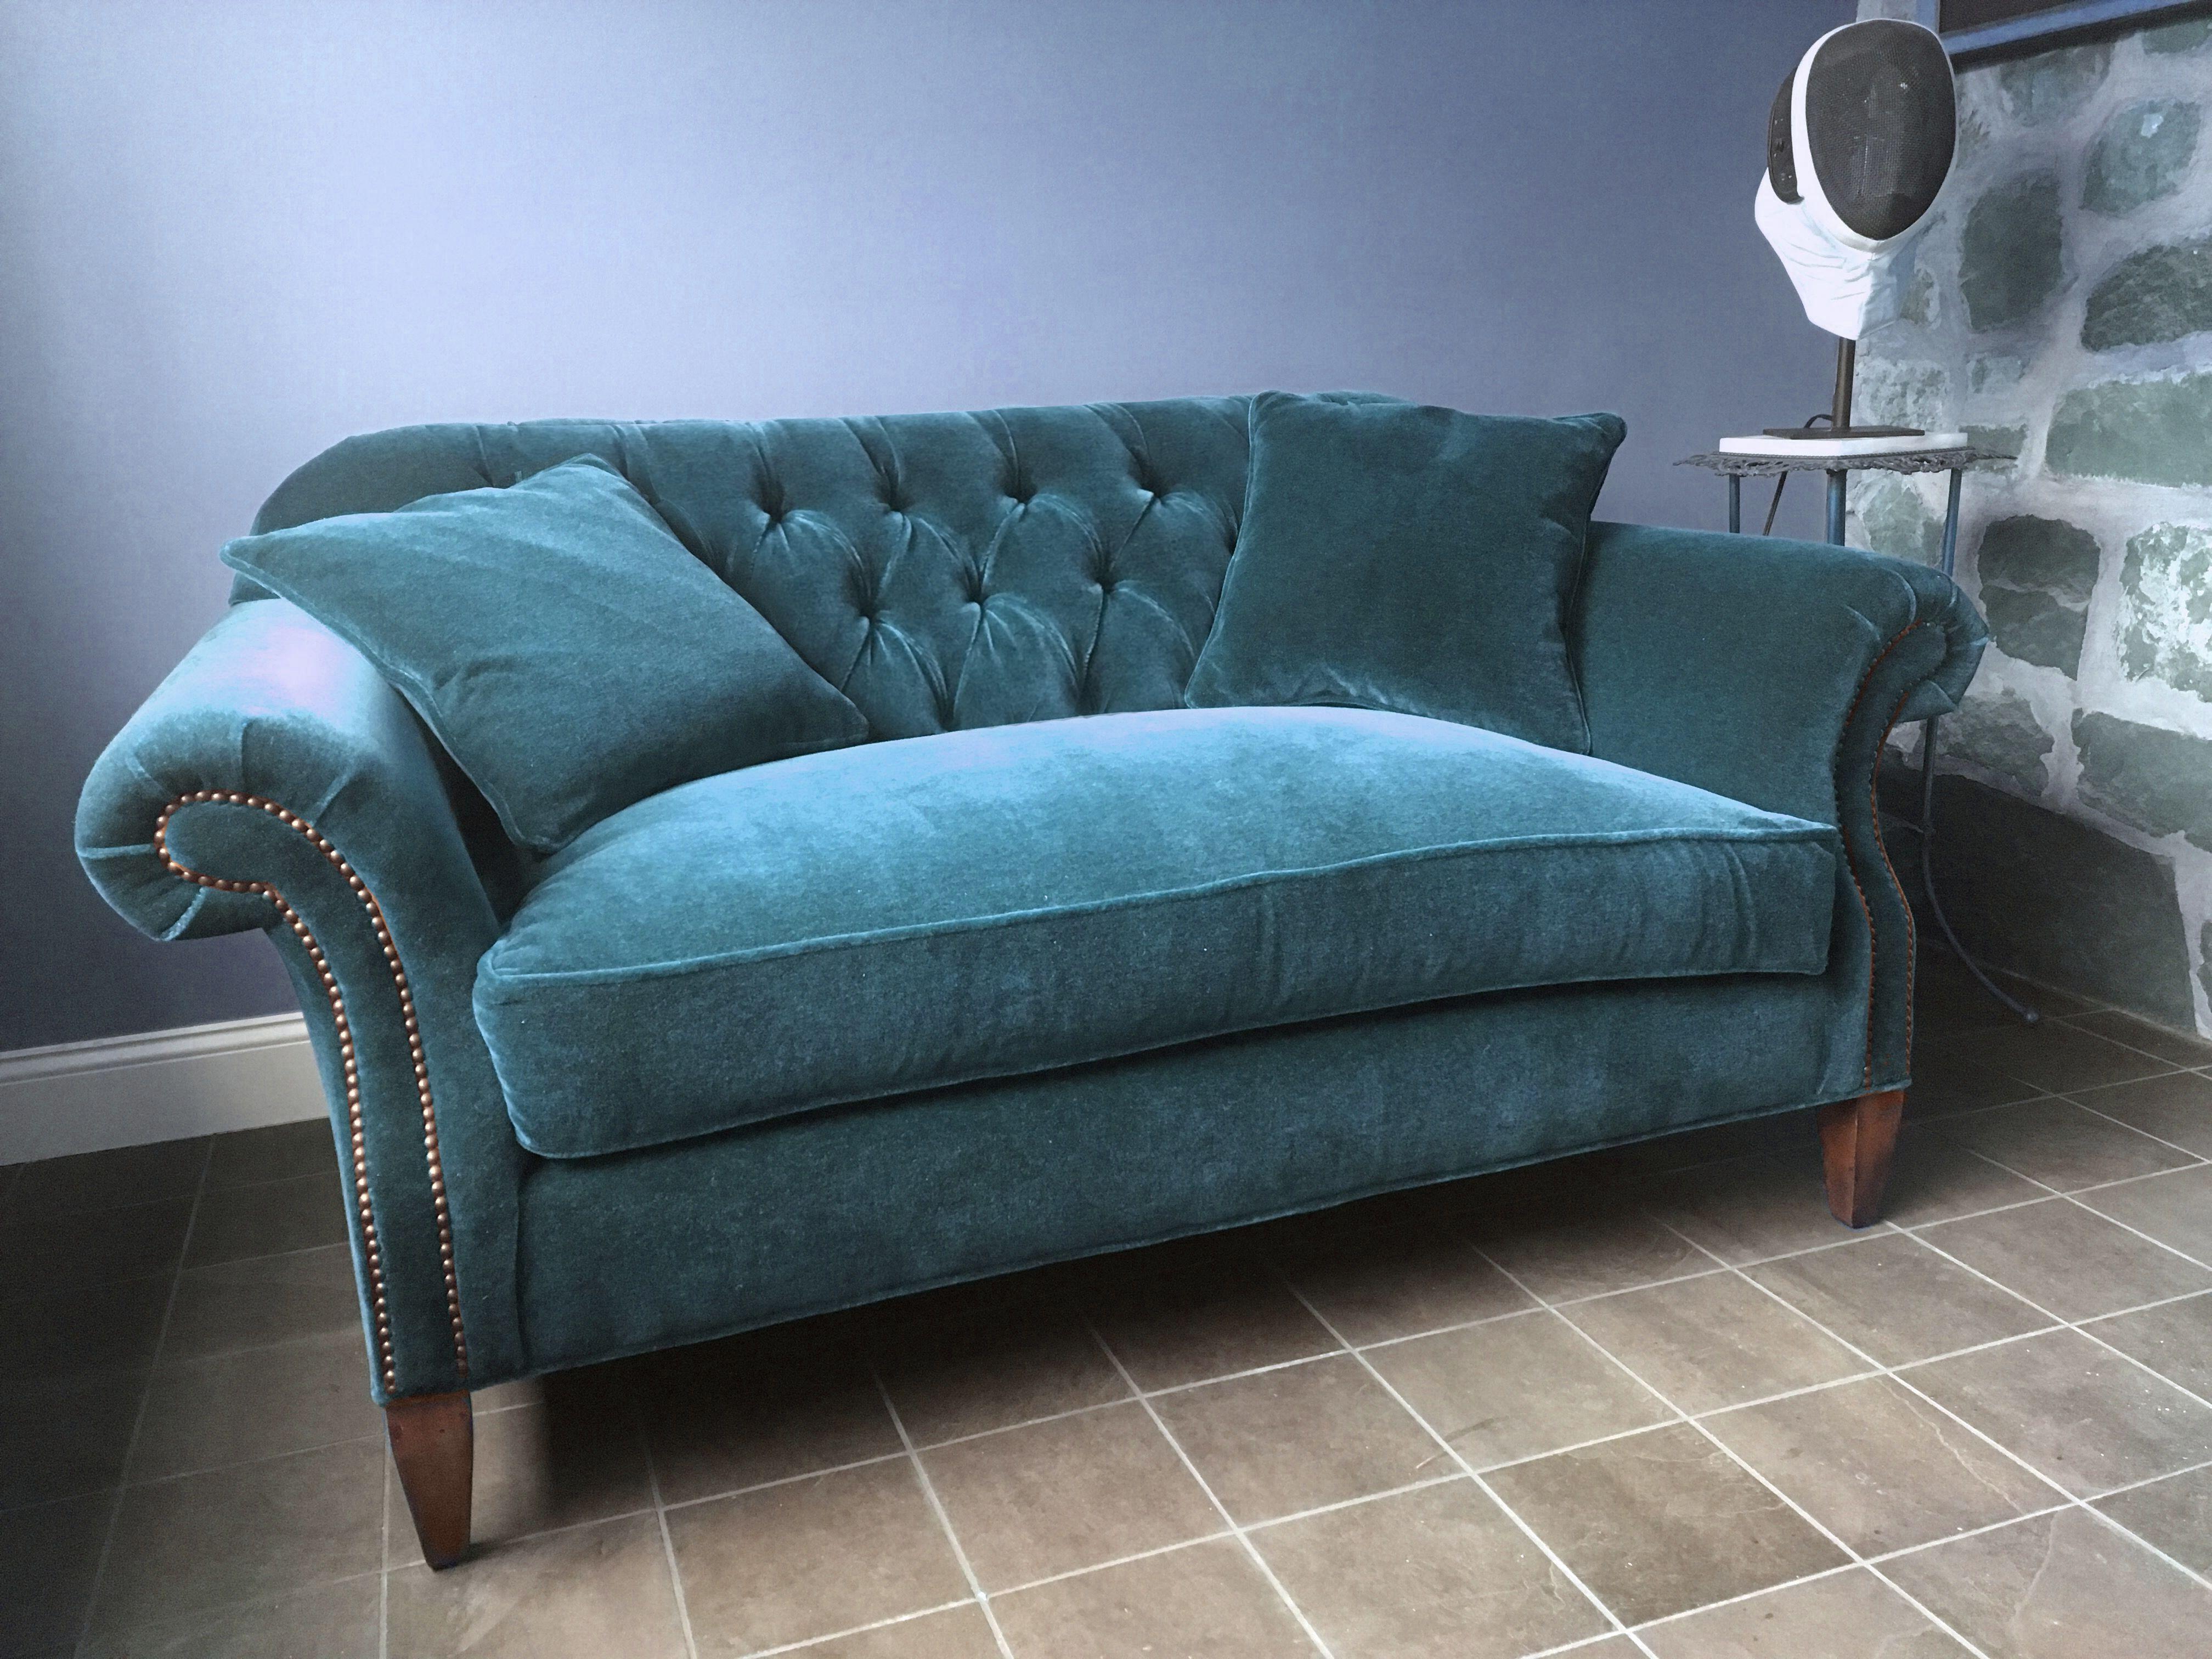 The Of Iron And Oak Whitman Loveseat Upholstered In Mohair Velvet American Made Furniture